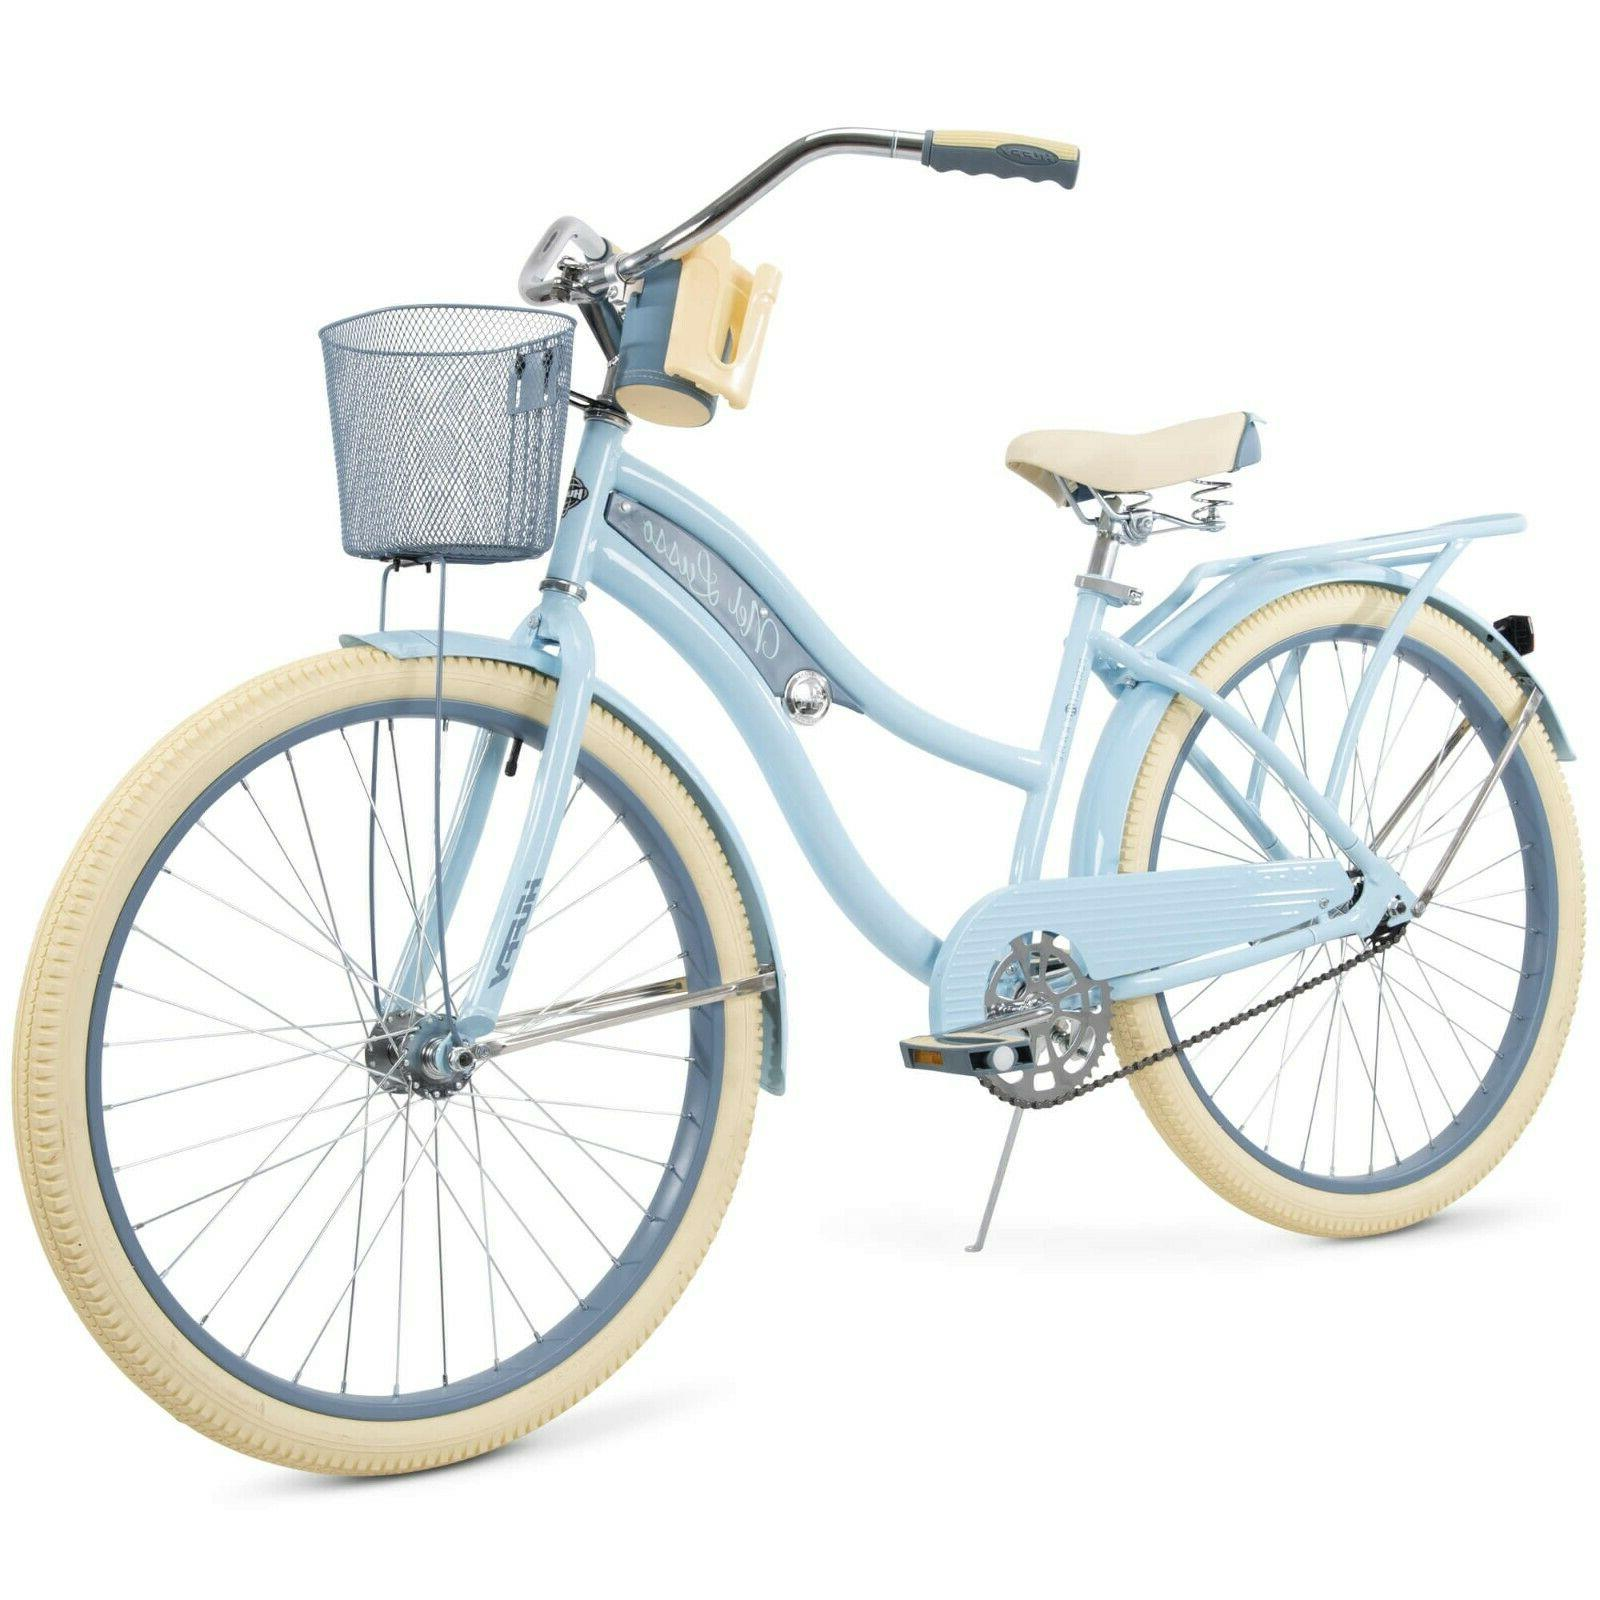 "Huffy 24"" Nel Lusso Girls' Cruiser Bike Pink Brand New SHIPS"